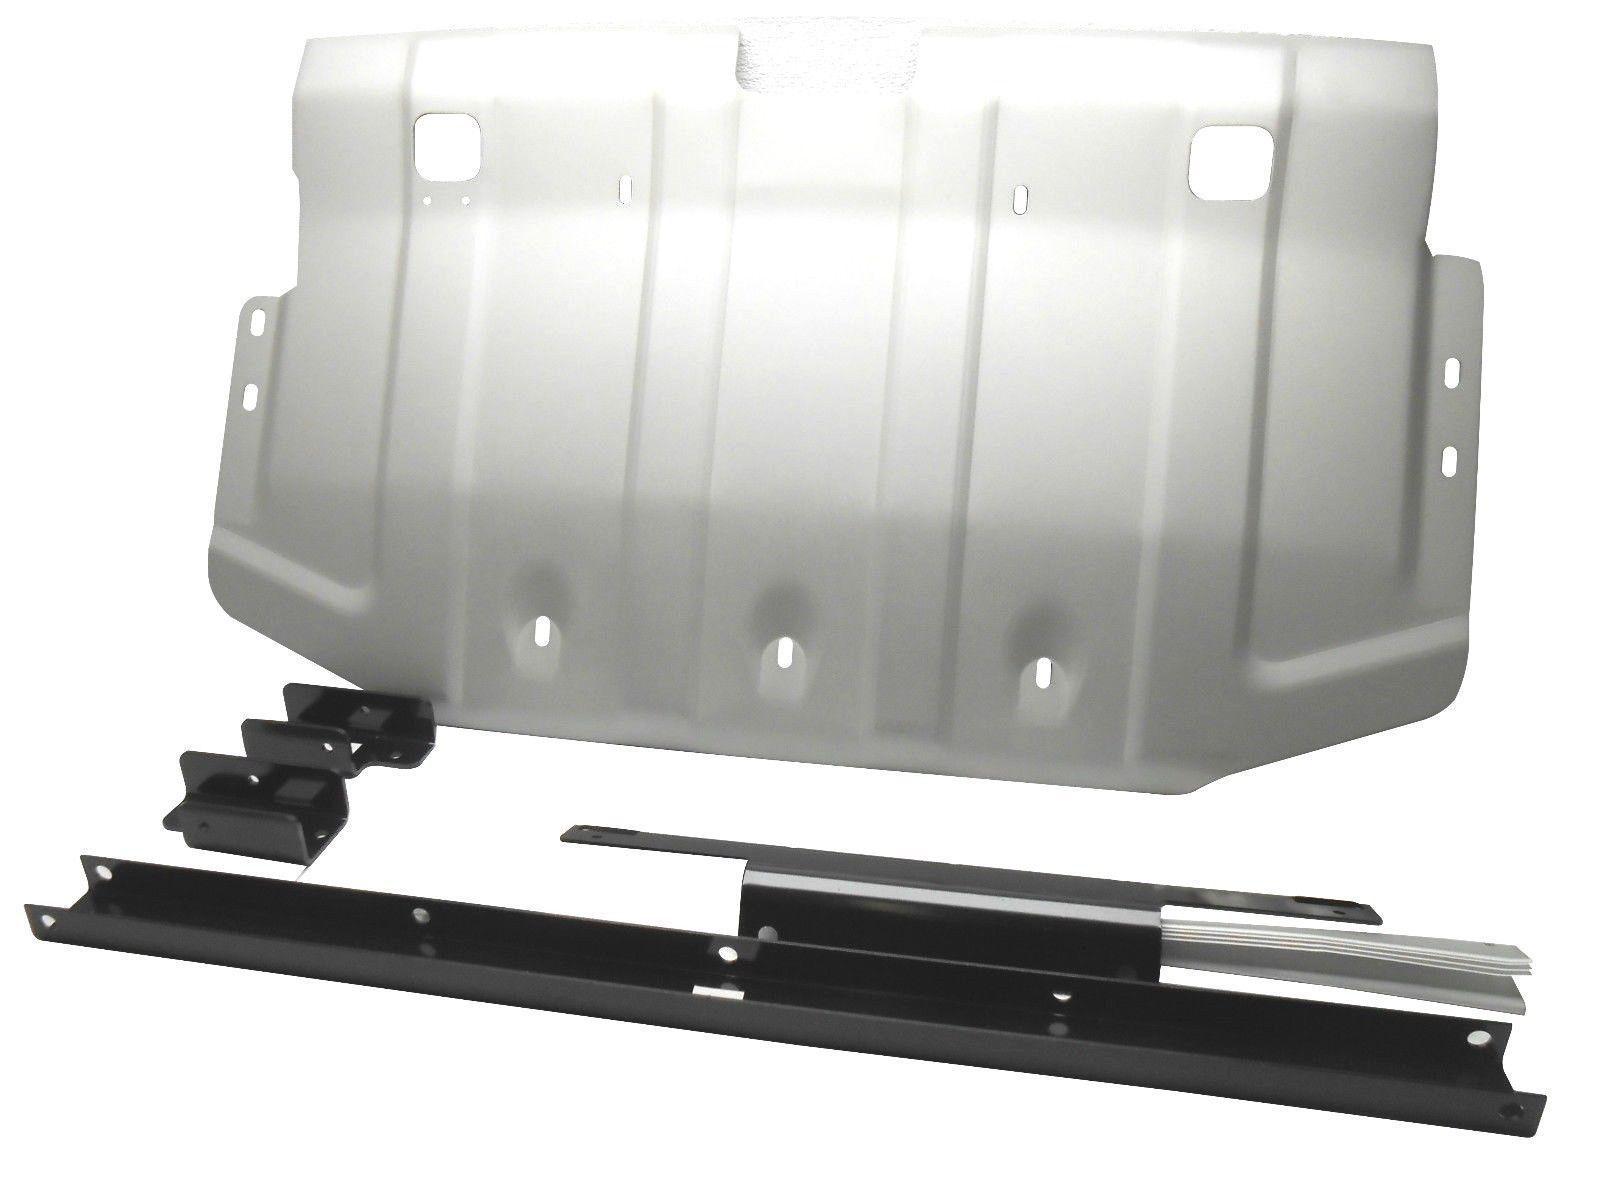 Aluminum Fj Cruiser Bumpers : Trd rear aluminum fj bumper skid obo toyota